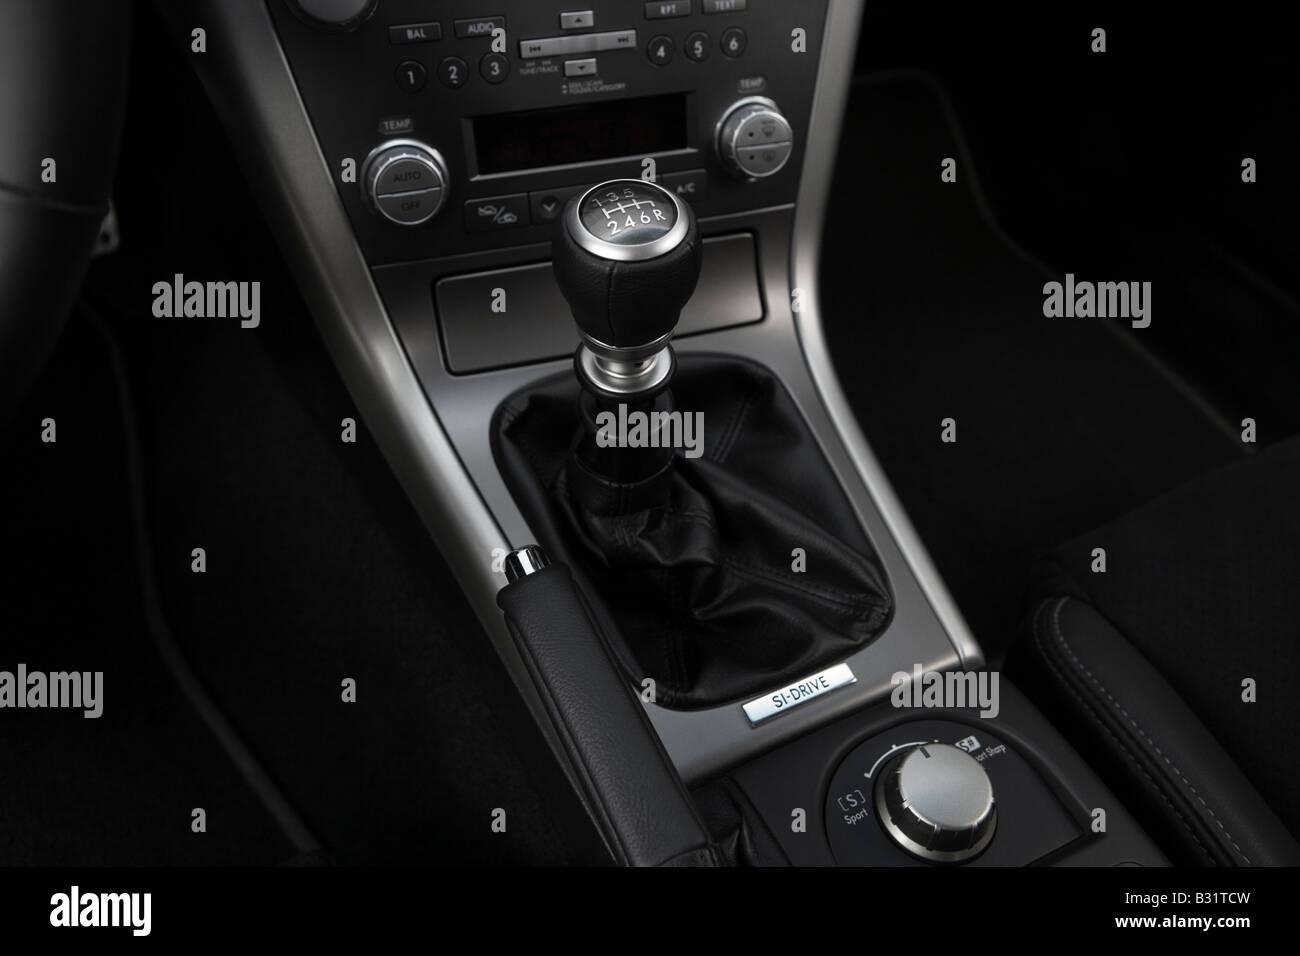 2009 subaru legacy 2 5 gt spec b in black gear shifter. Black Bedroom Furniture Sets. Home Design Ideas